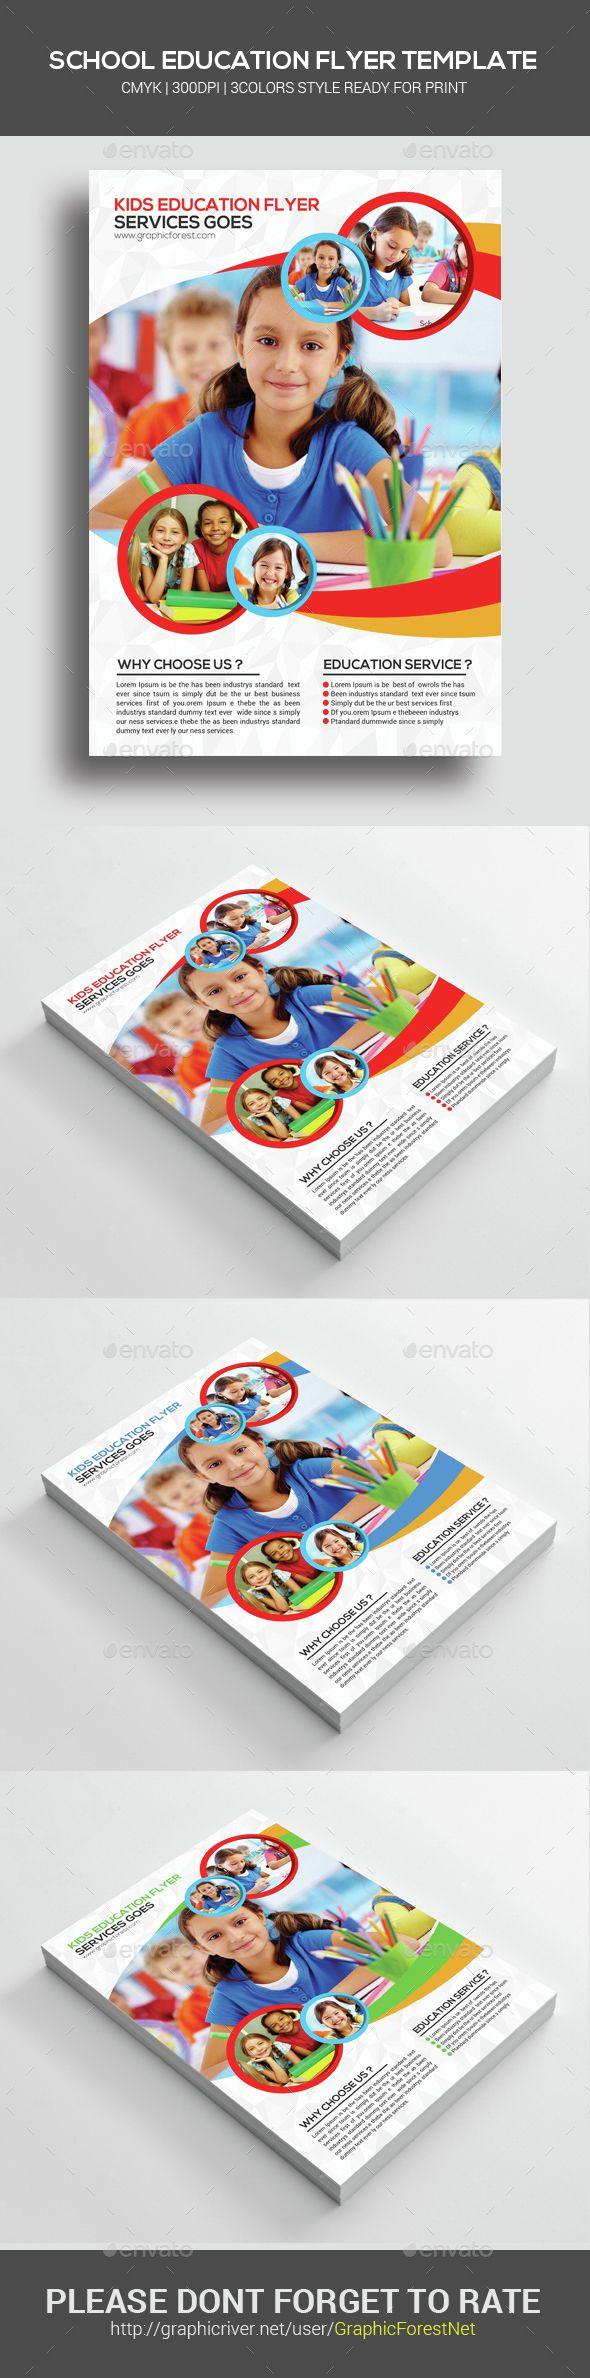 school flyer templates